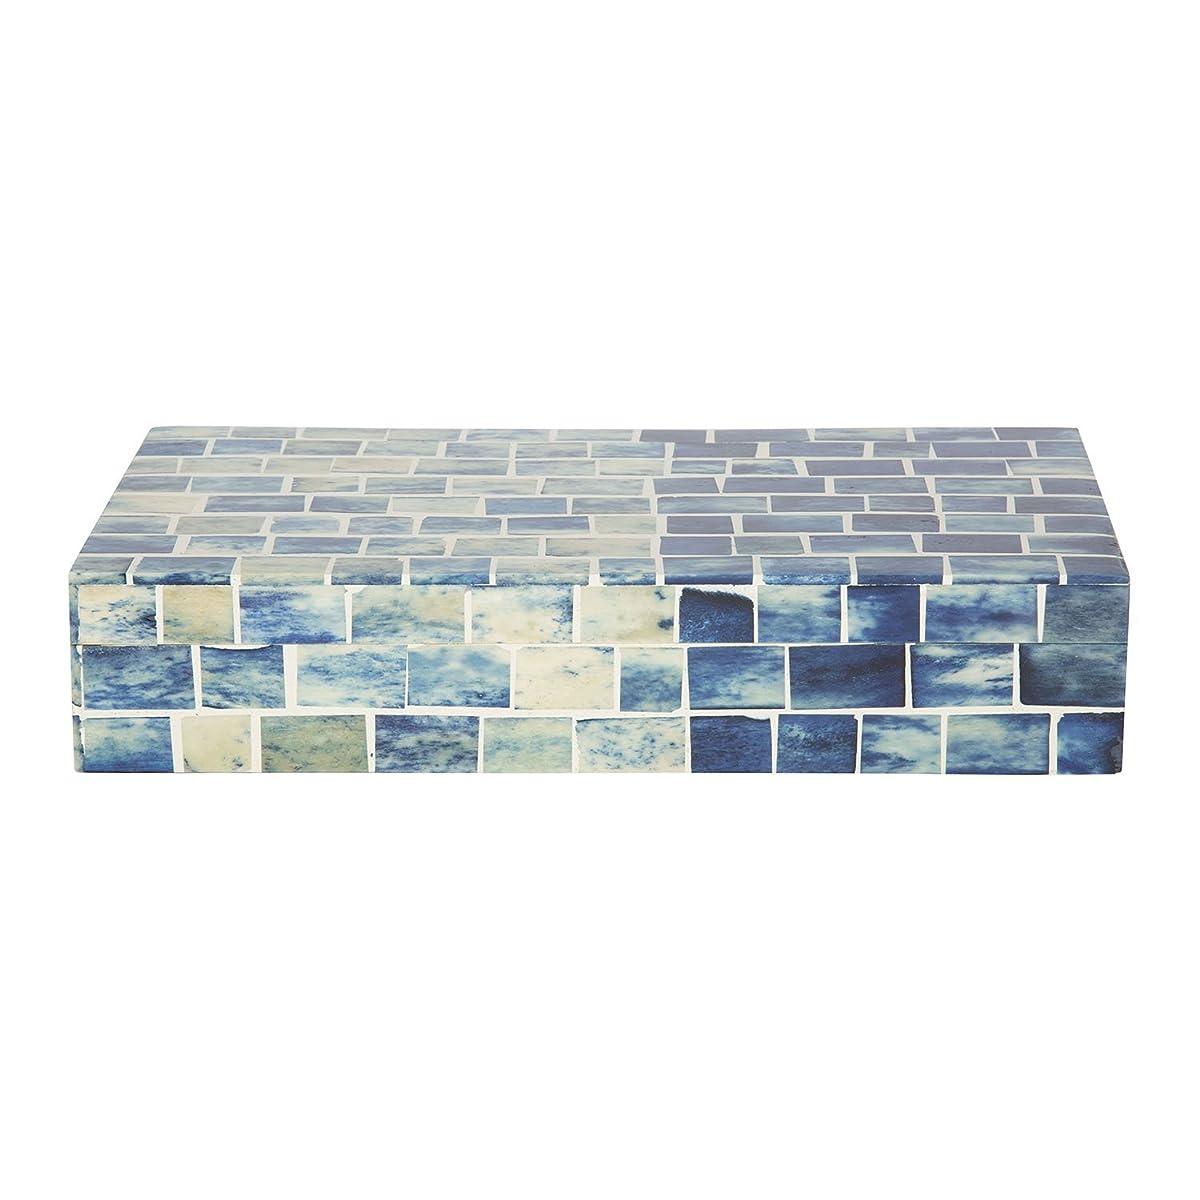 Indigo Mosaic Keepsake Decorative Jewelry Storage Organizer Box Handmade from Hanidcrafts Home Size 10x5x2 inches